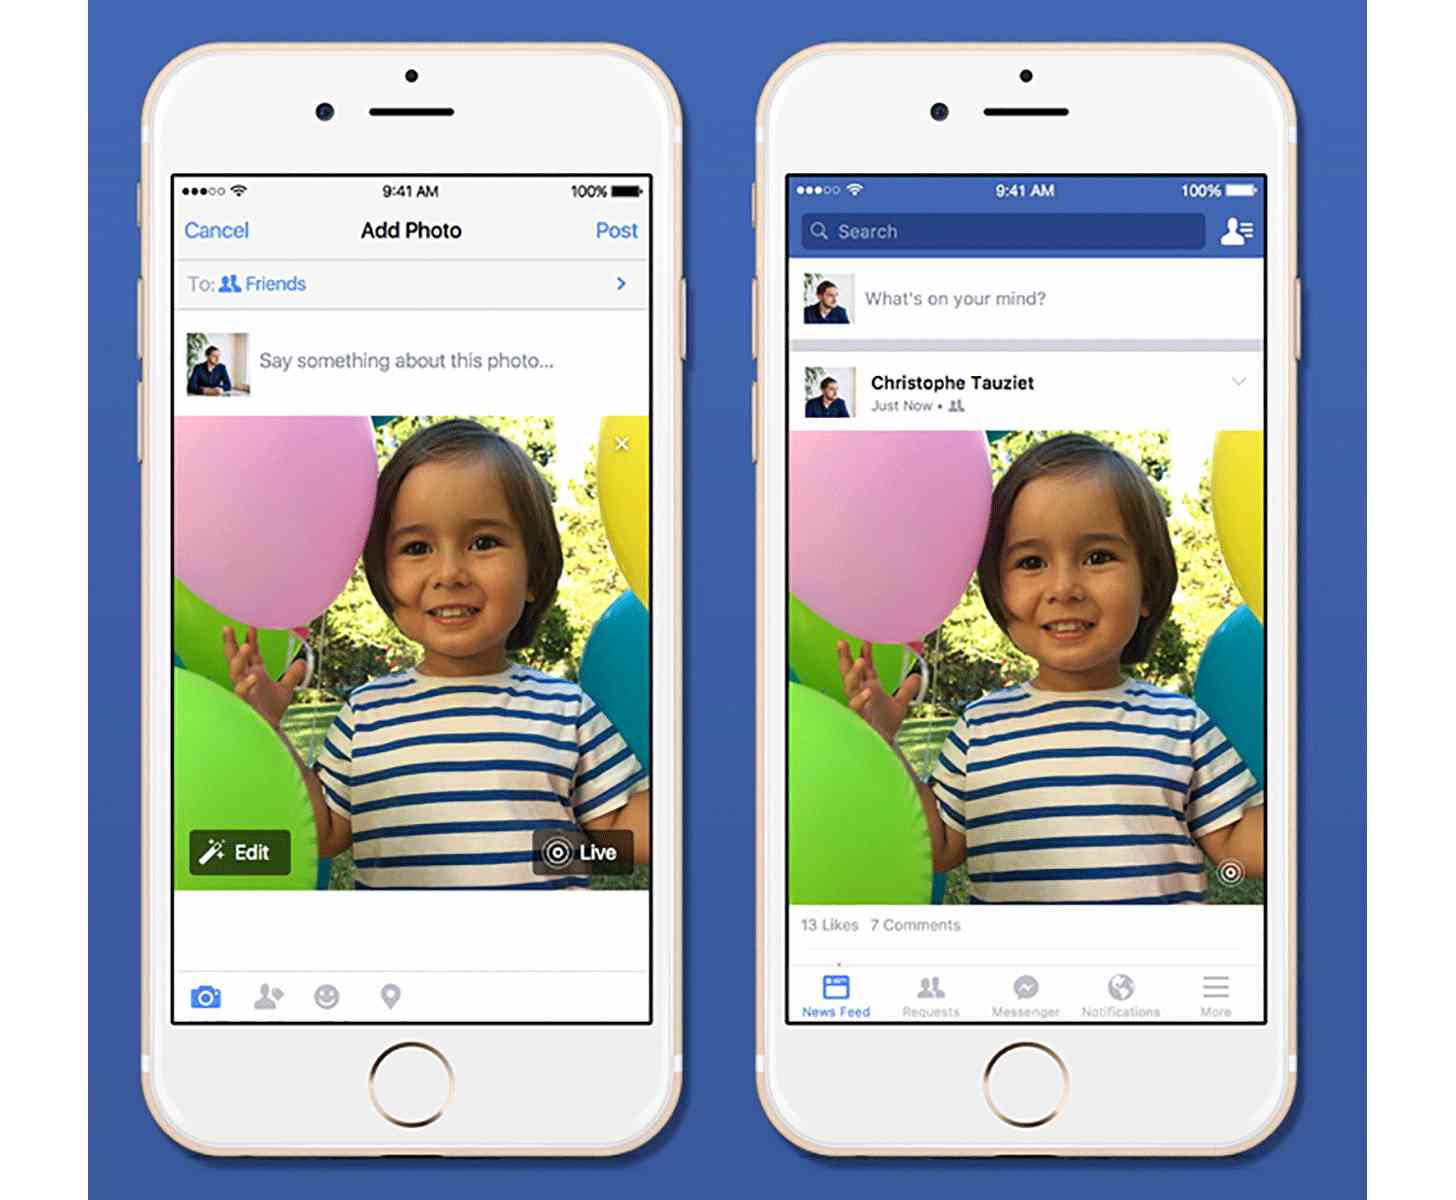 Facebook Live Photos support